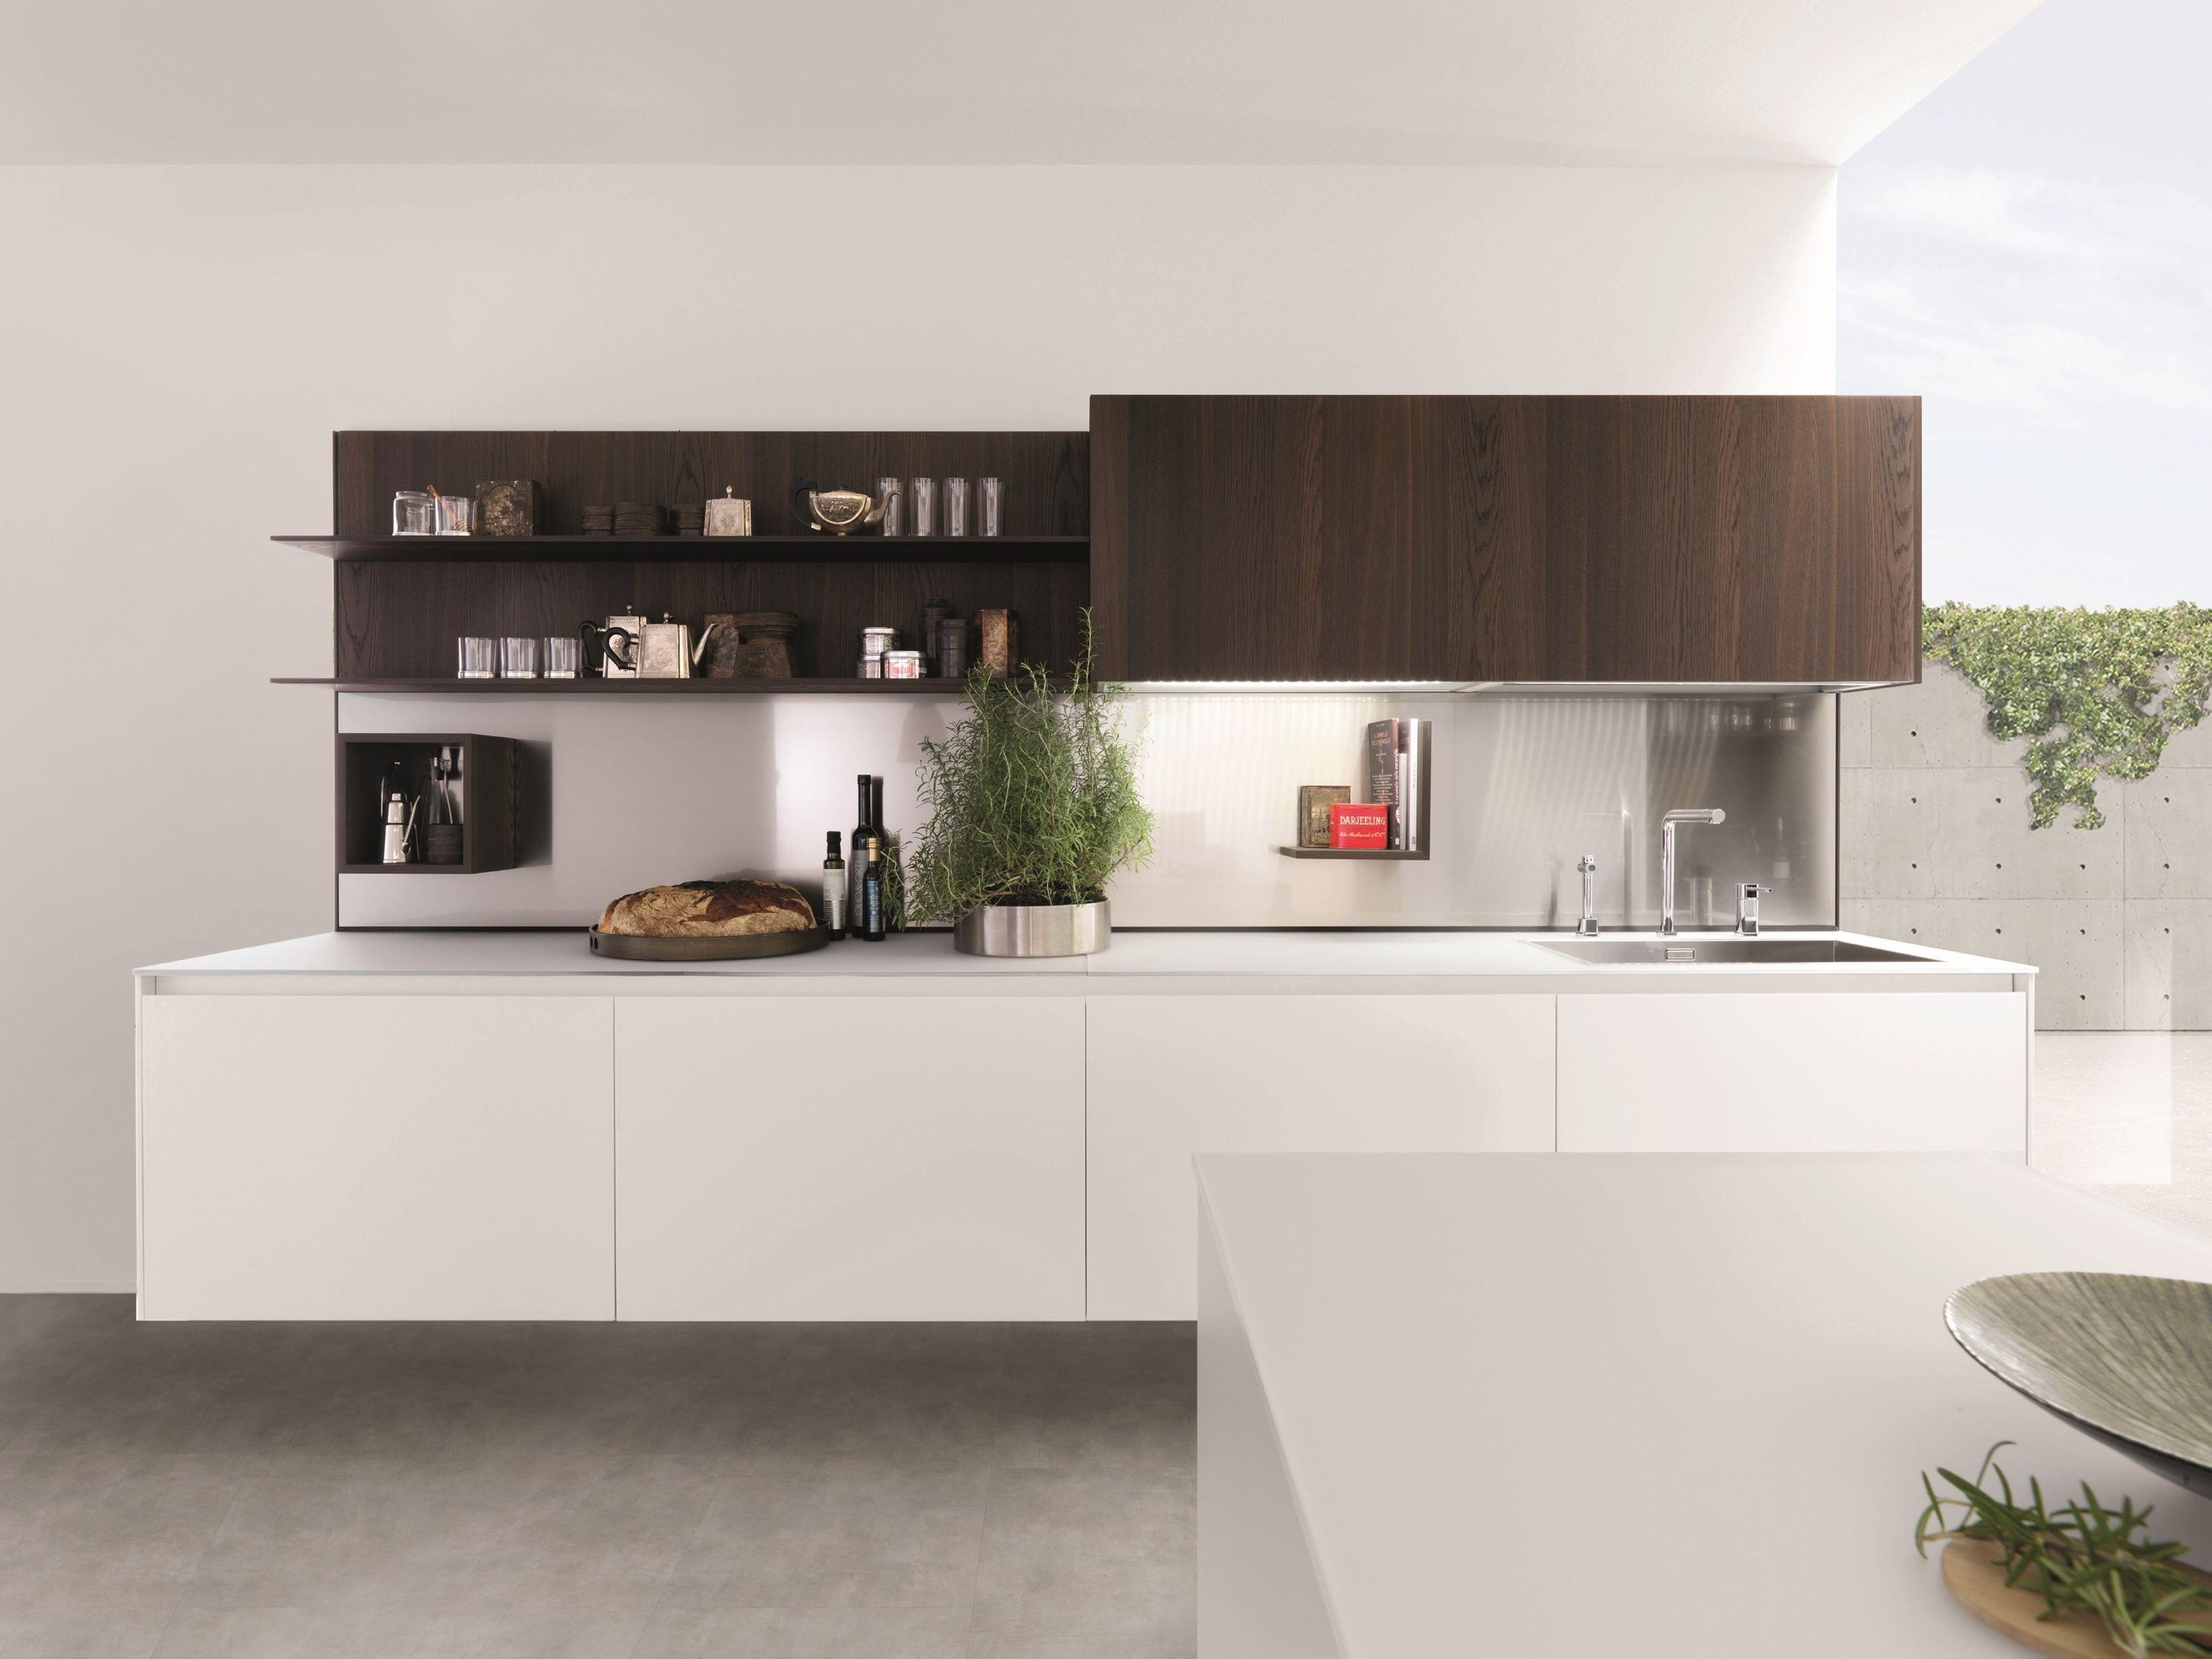 cucina | prodotti euromobil | archiproducts - Cucina Euromobil